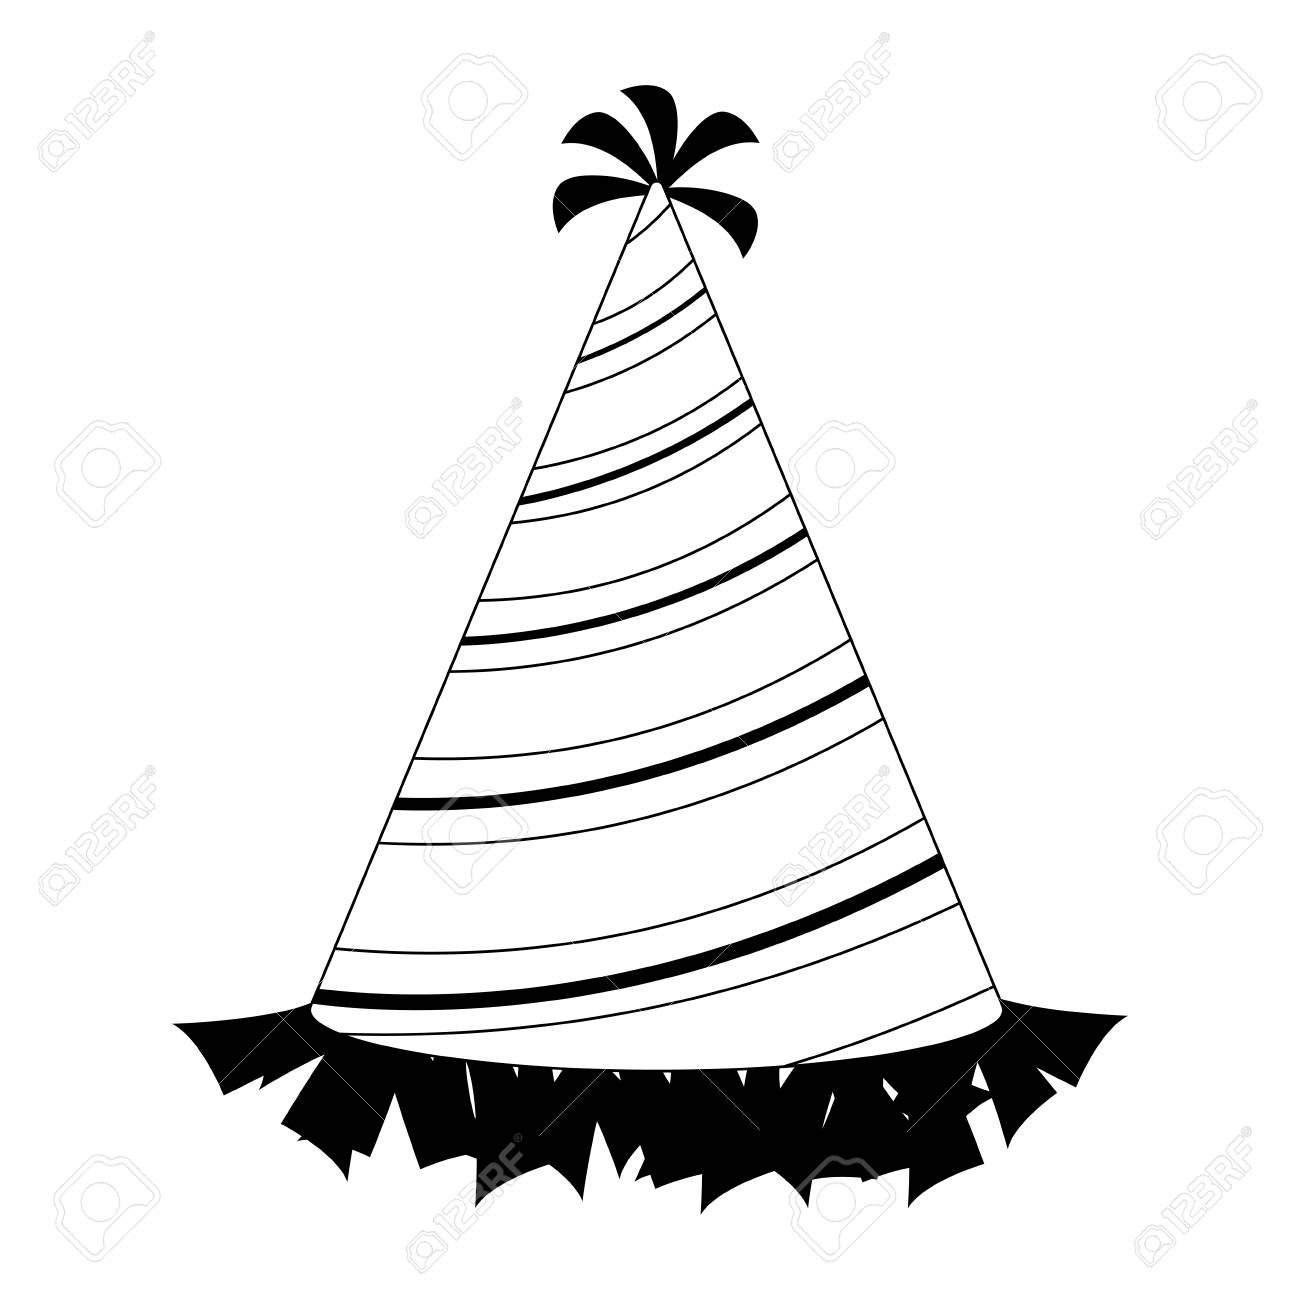 Birthday hat cartoon black and white Royalty Free Vector